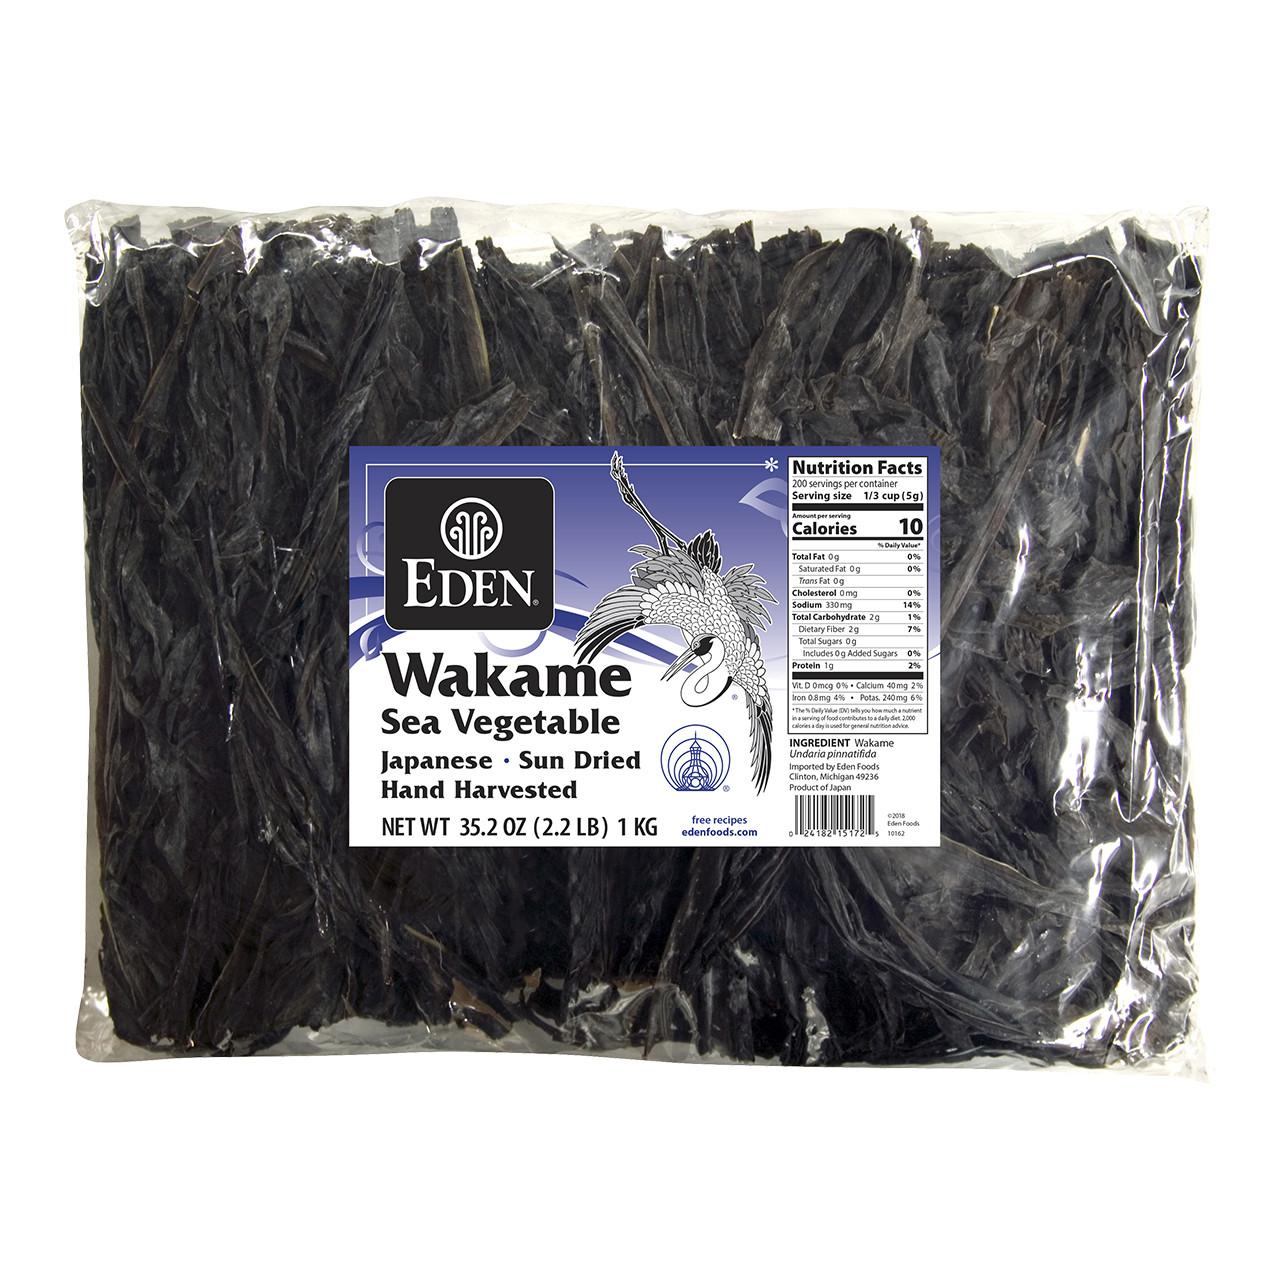 Wakame, Sea Vegetable - 2.2 lb